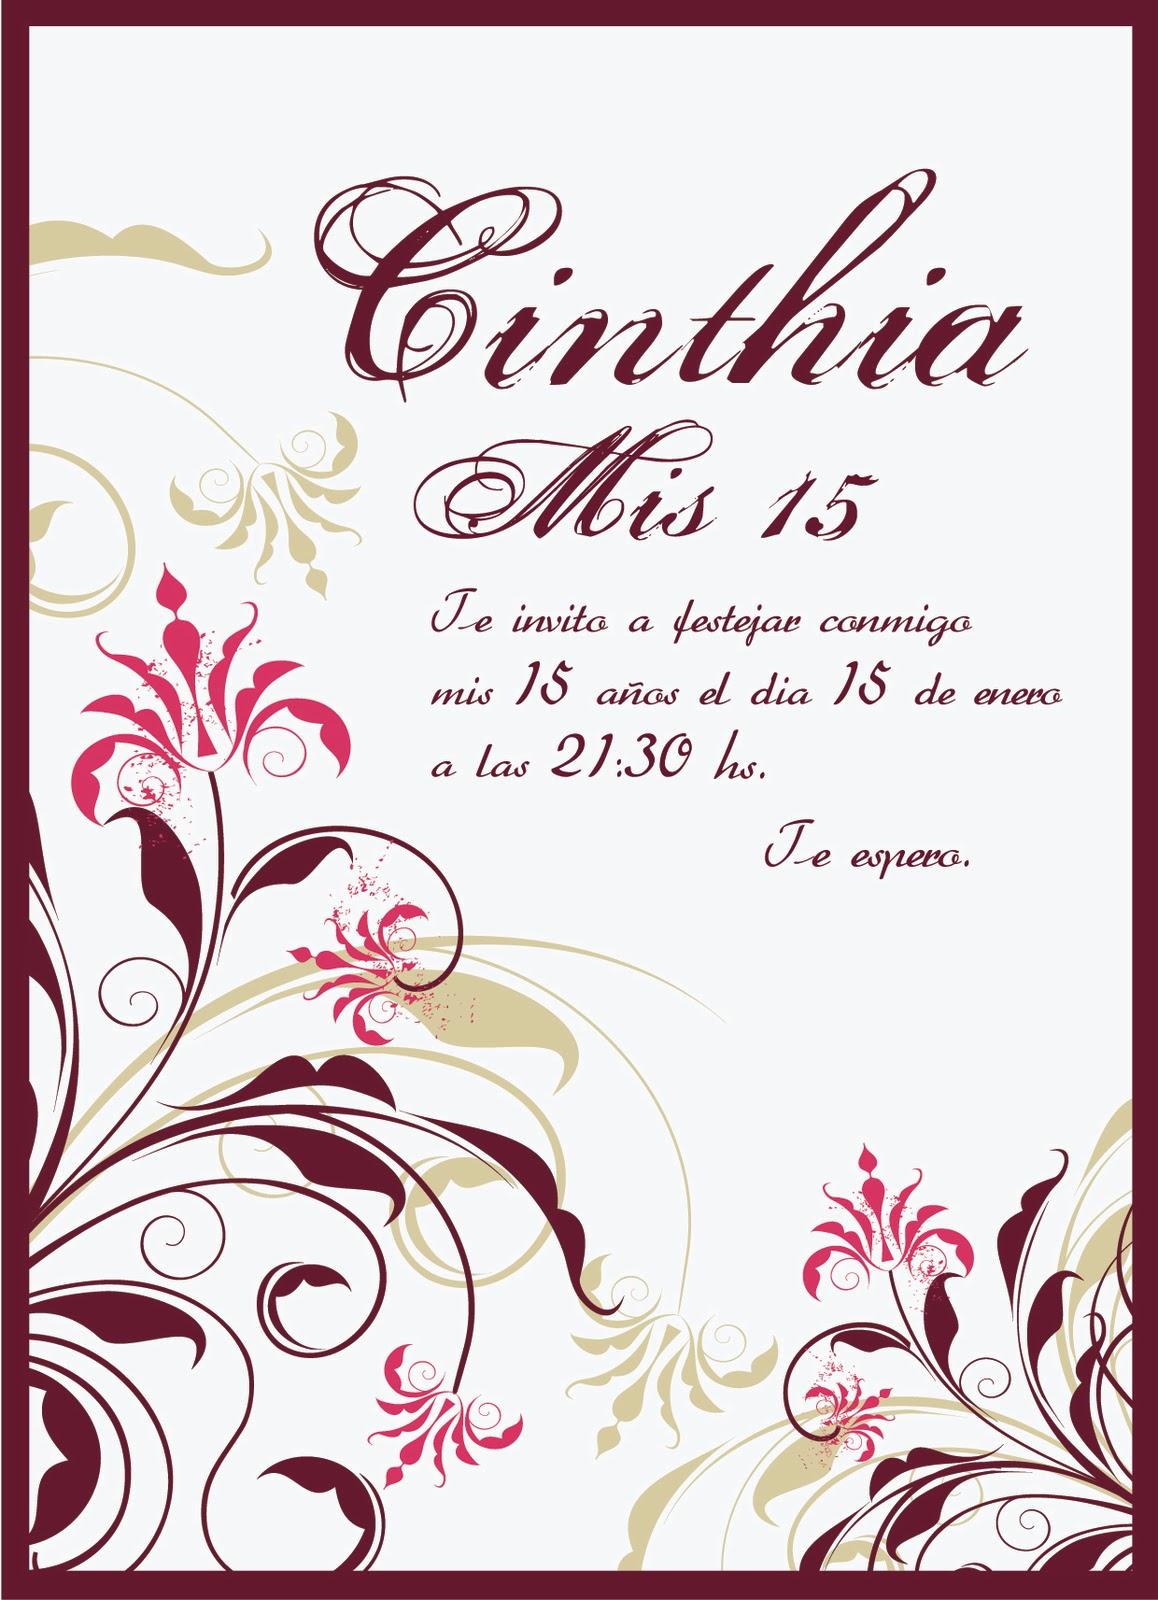 tarjeta de invitacion para cumpleanos de 15 montada sobre cartulina